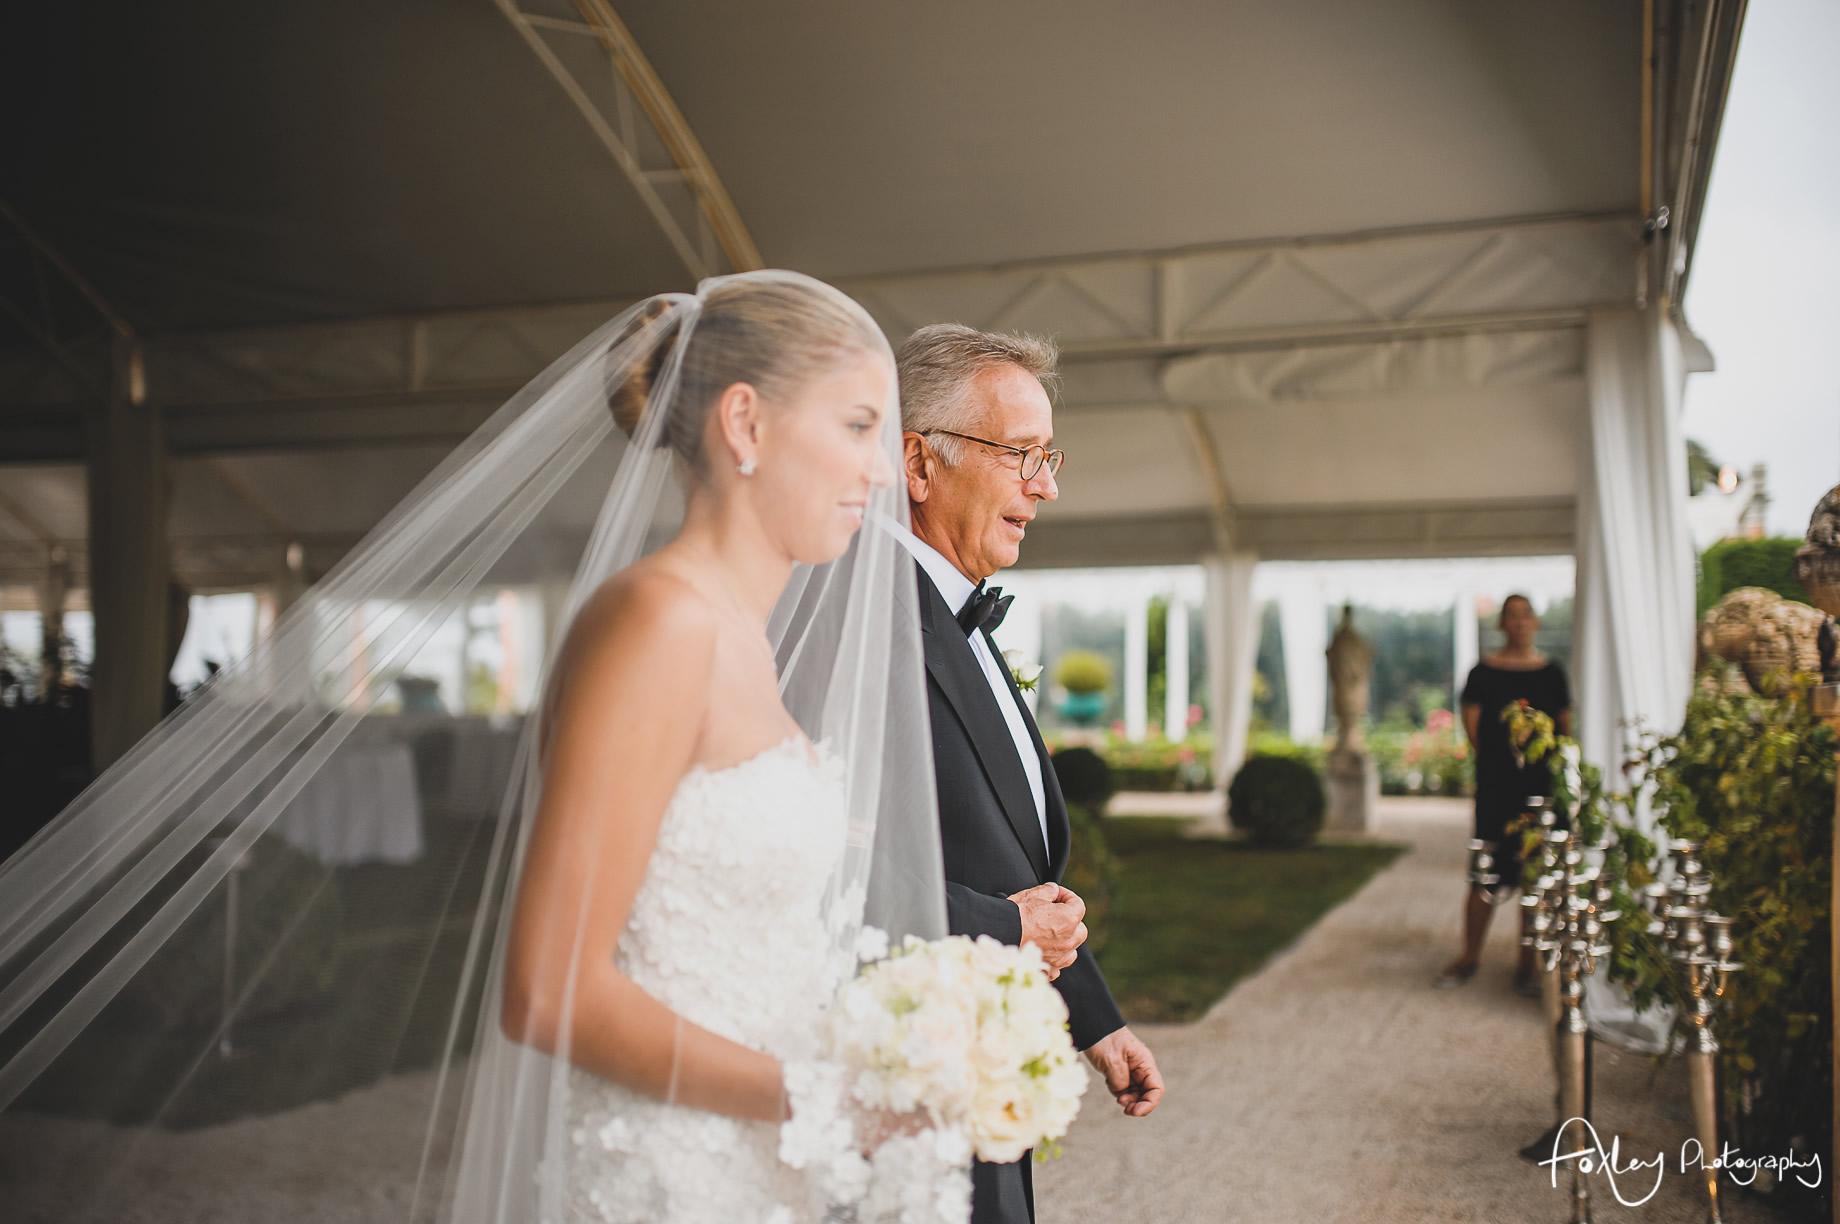 Jil and Will's Wedding at Villa Ephrussi De Rothschild 087